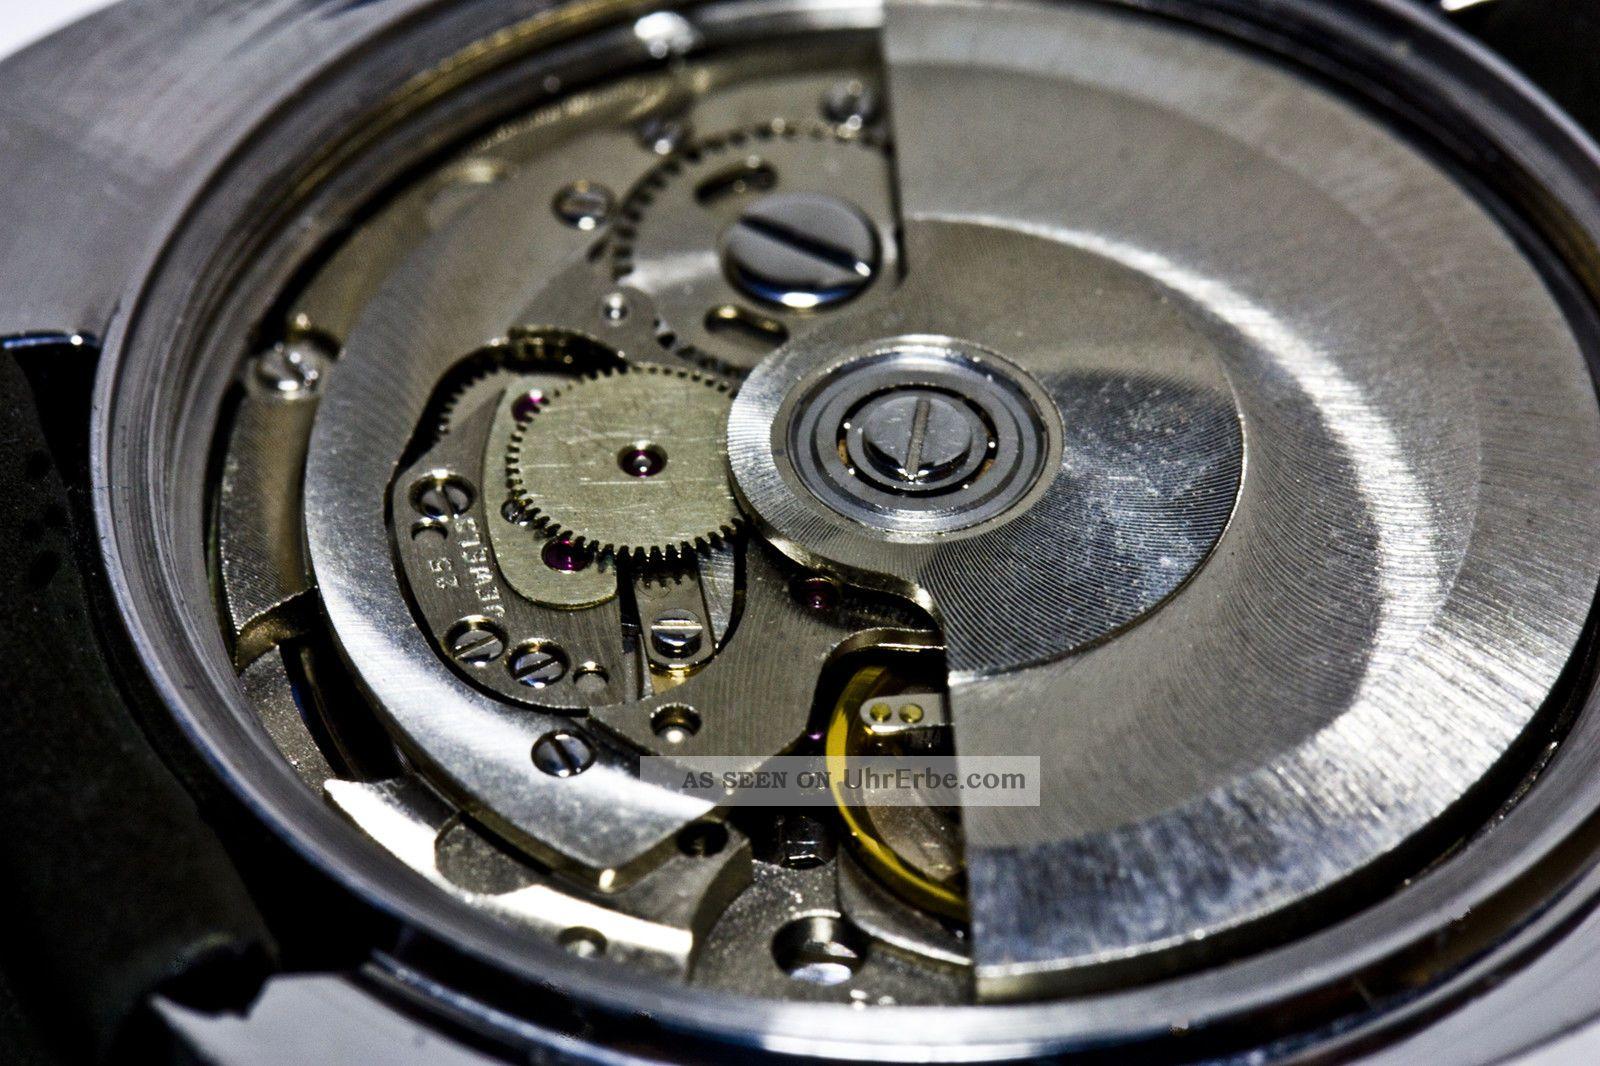 https://i1.wp.com/uhrerbe.com/imgs/a/b/t/v/k/arsa_chronometer_automatic_daydate_cal_as1920_chronospeed_f36000_ah_swiss_1970_4_lgw.jpg